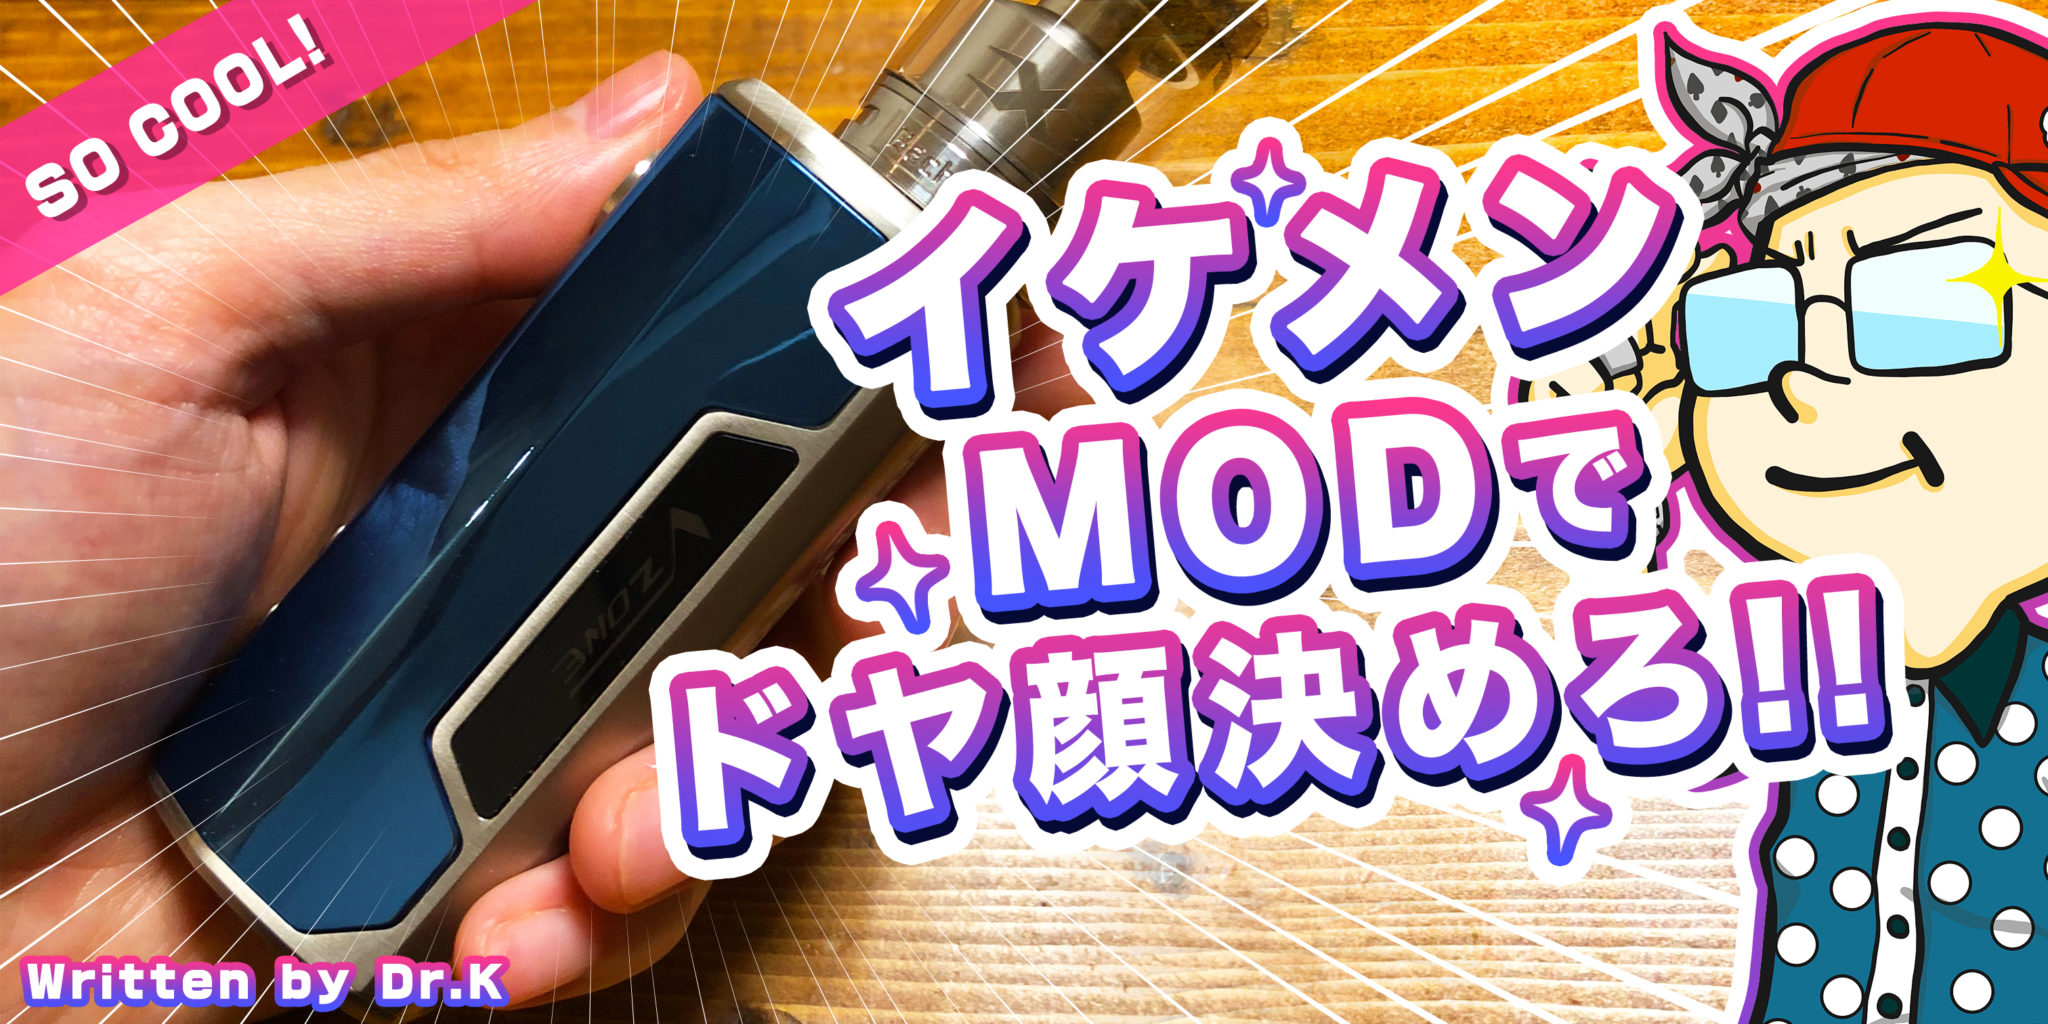 catch 5 - 【レビュー】これぞイケメンMOD!! Vzone Cultura 100W(ブイゾーン・カルチュラ)でオトコを磨け!!!